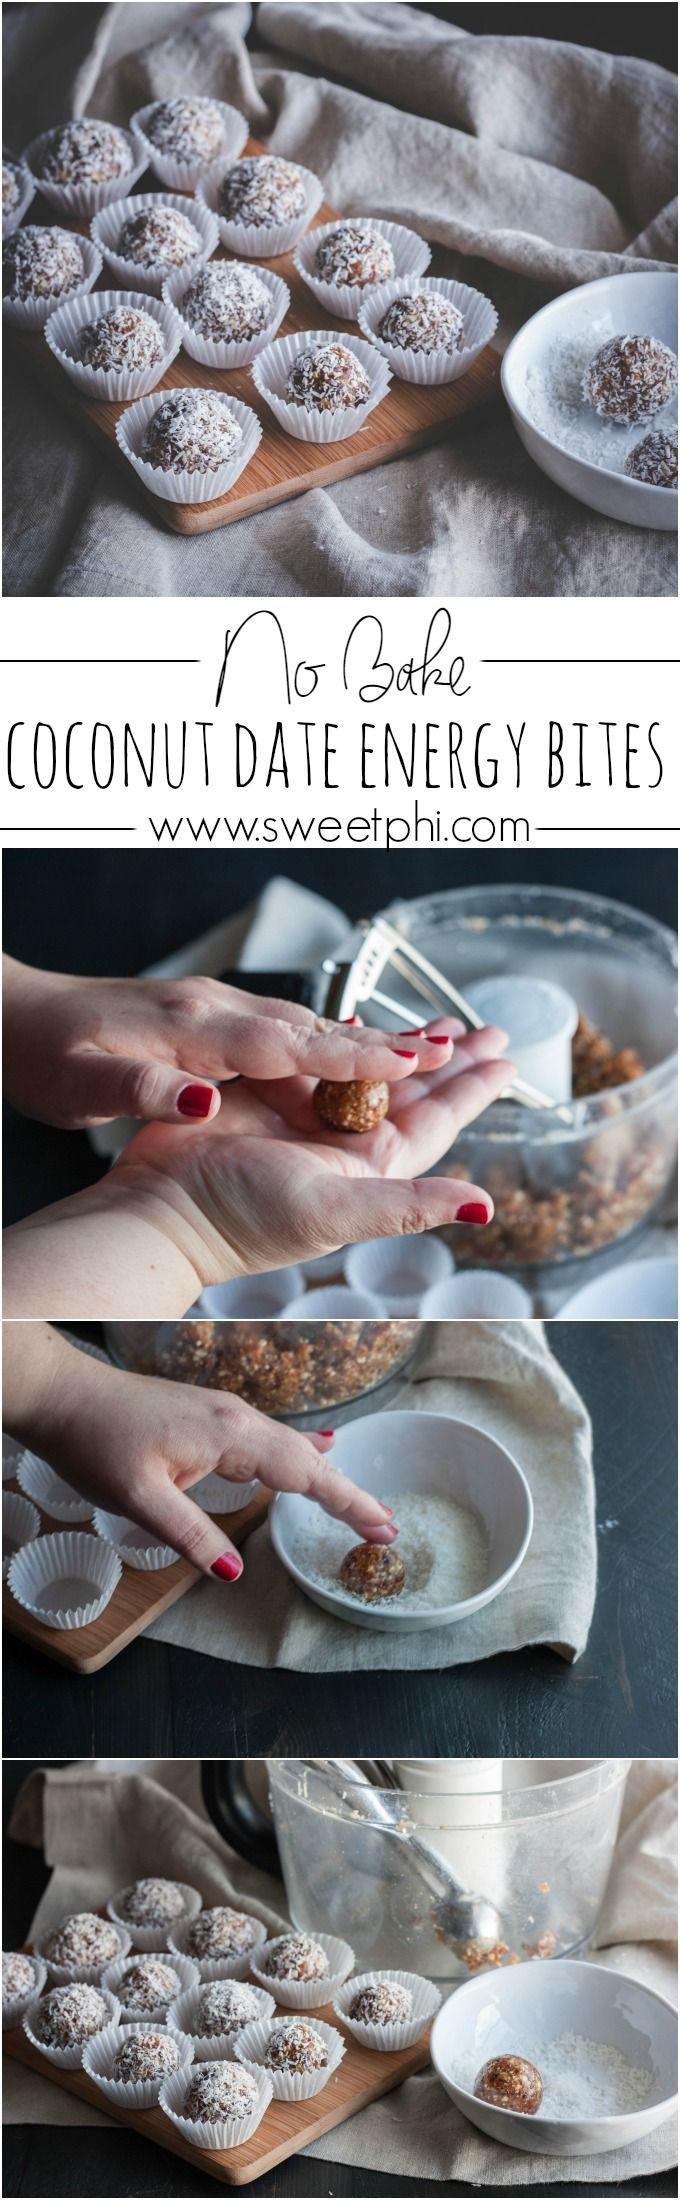 No bake coconut date energy bites, date energy balls, gluten free and vegan recipe